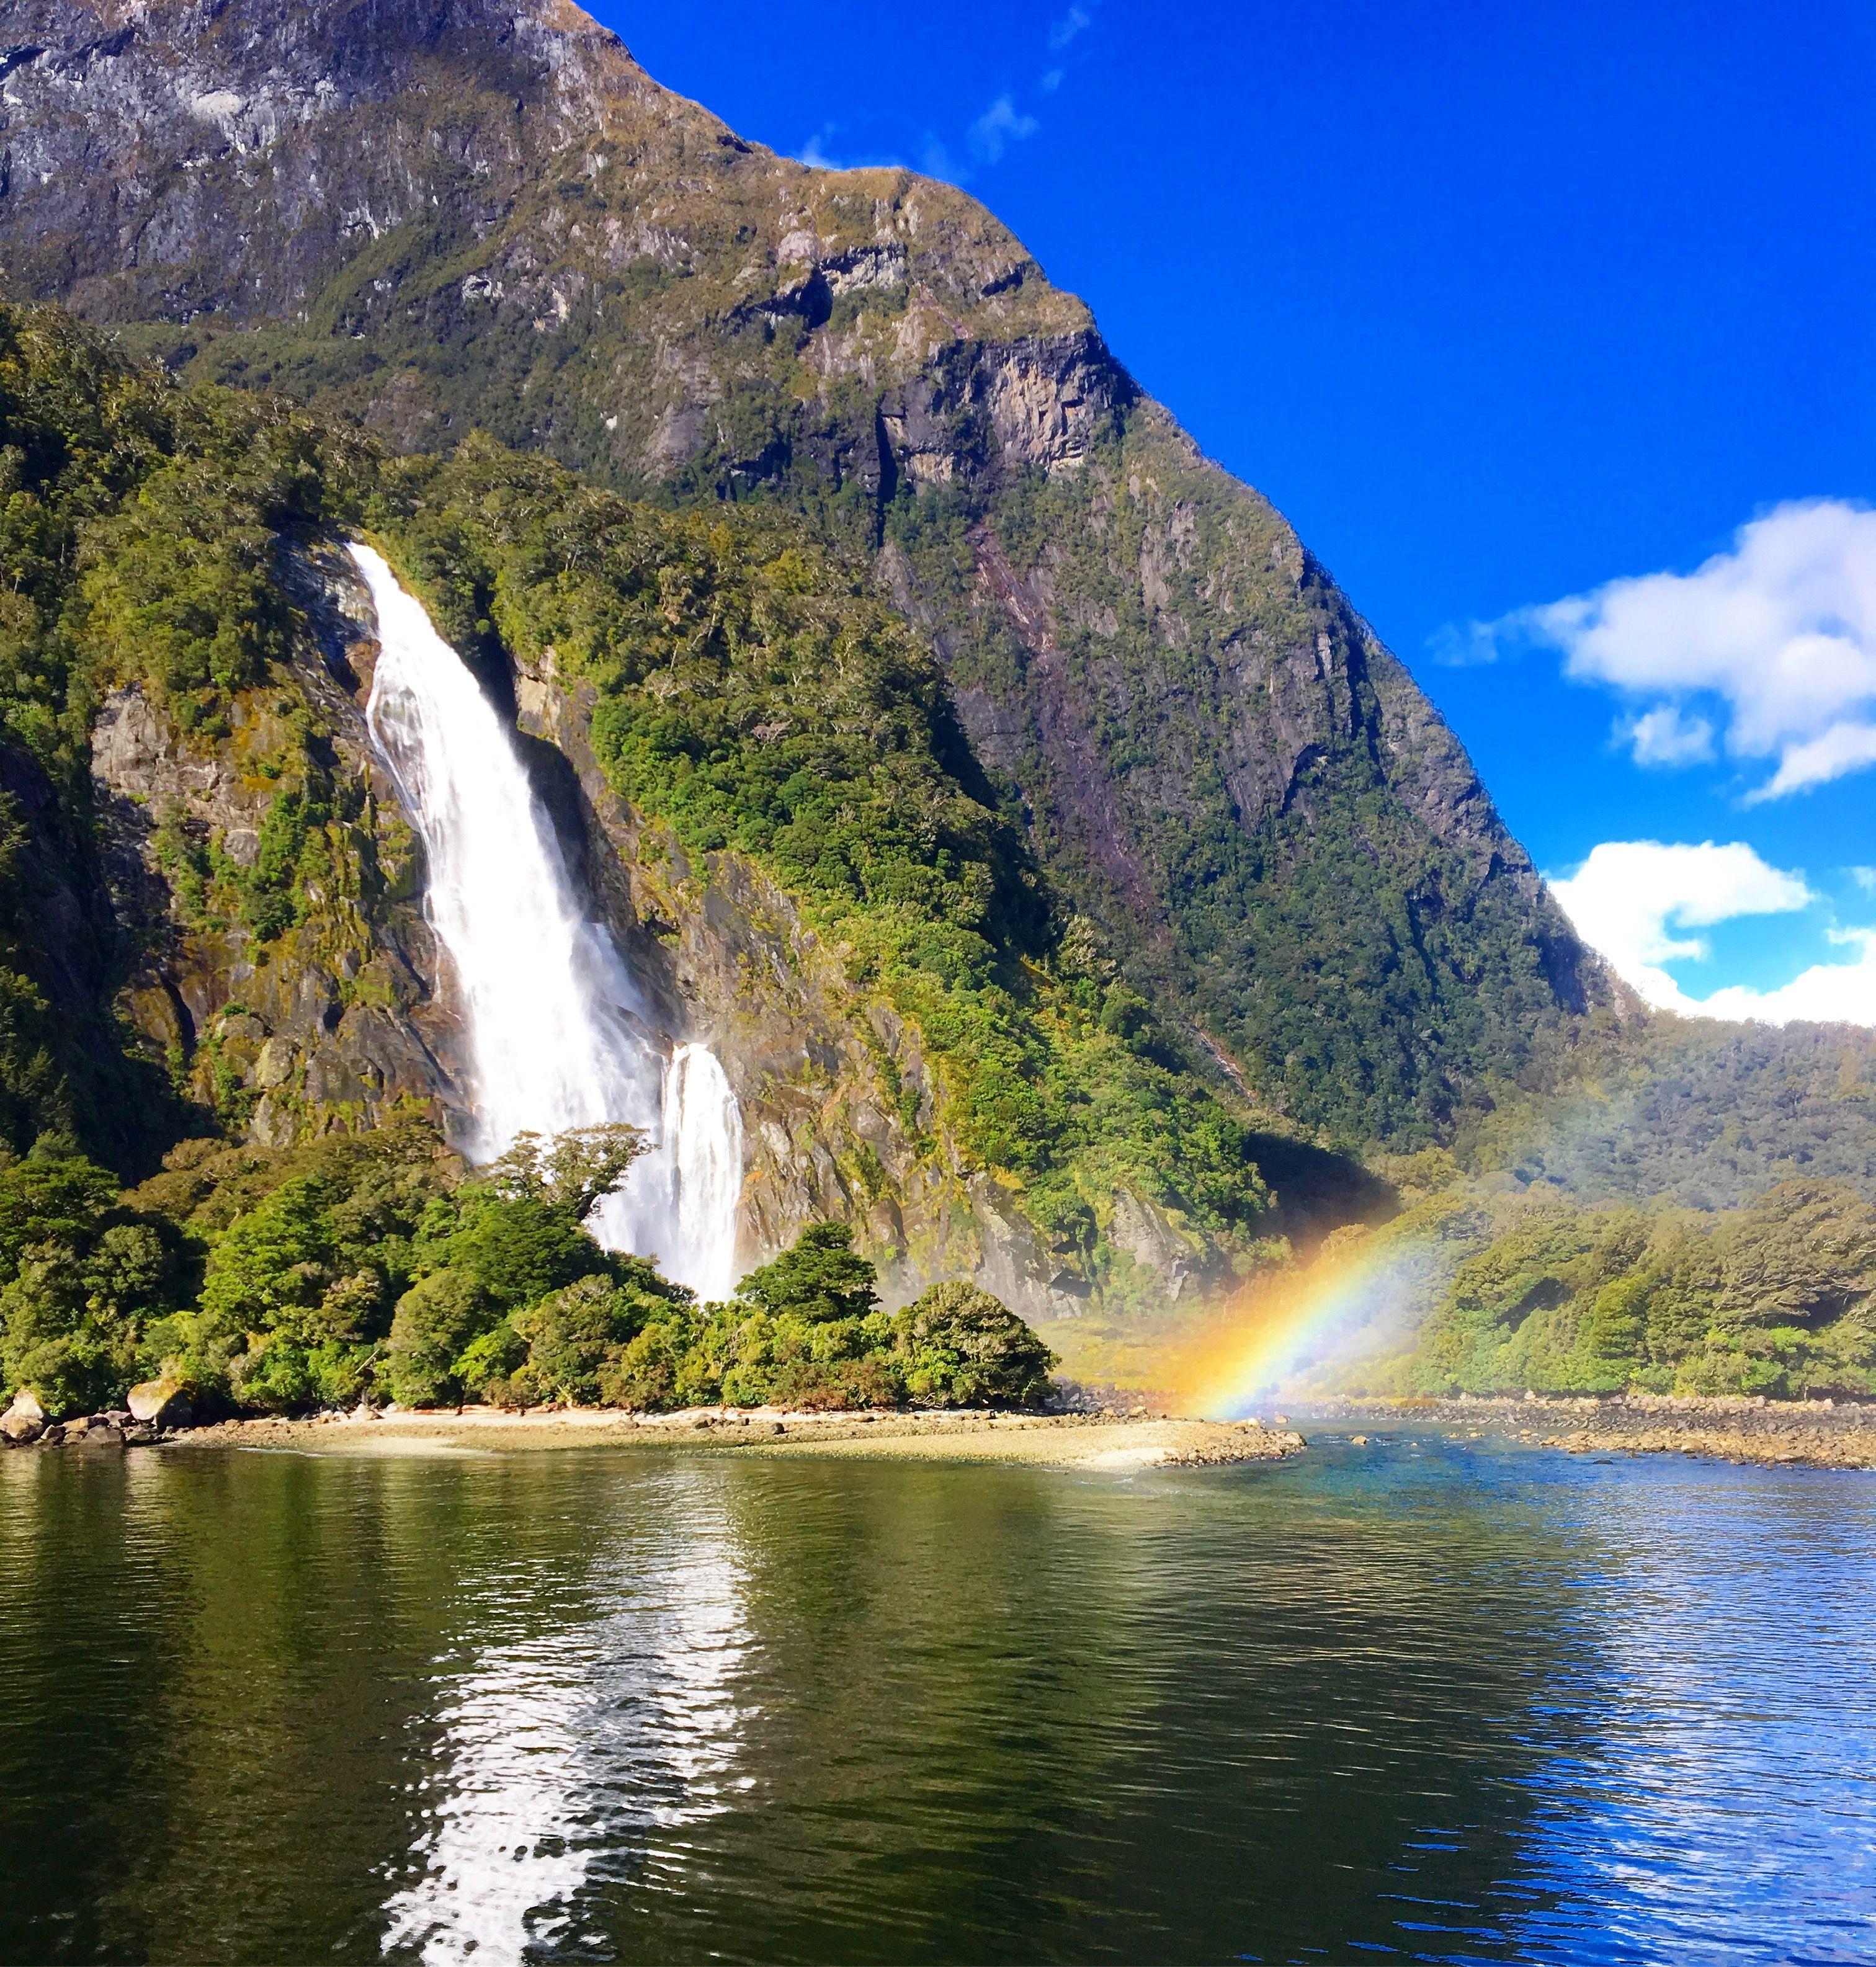 Milford Sound New Zealand Travel inspiration, Milford